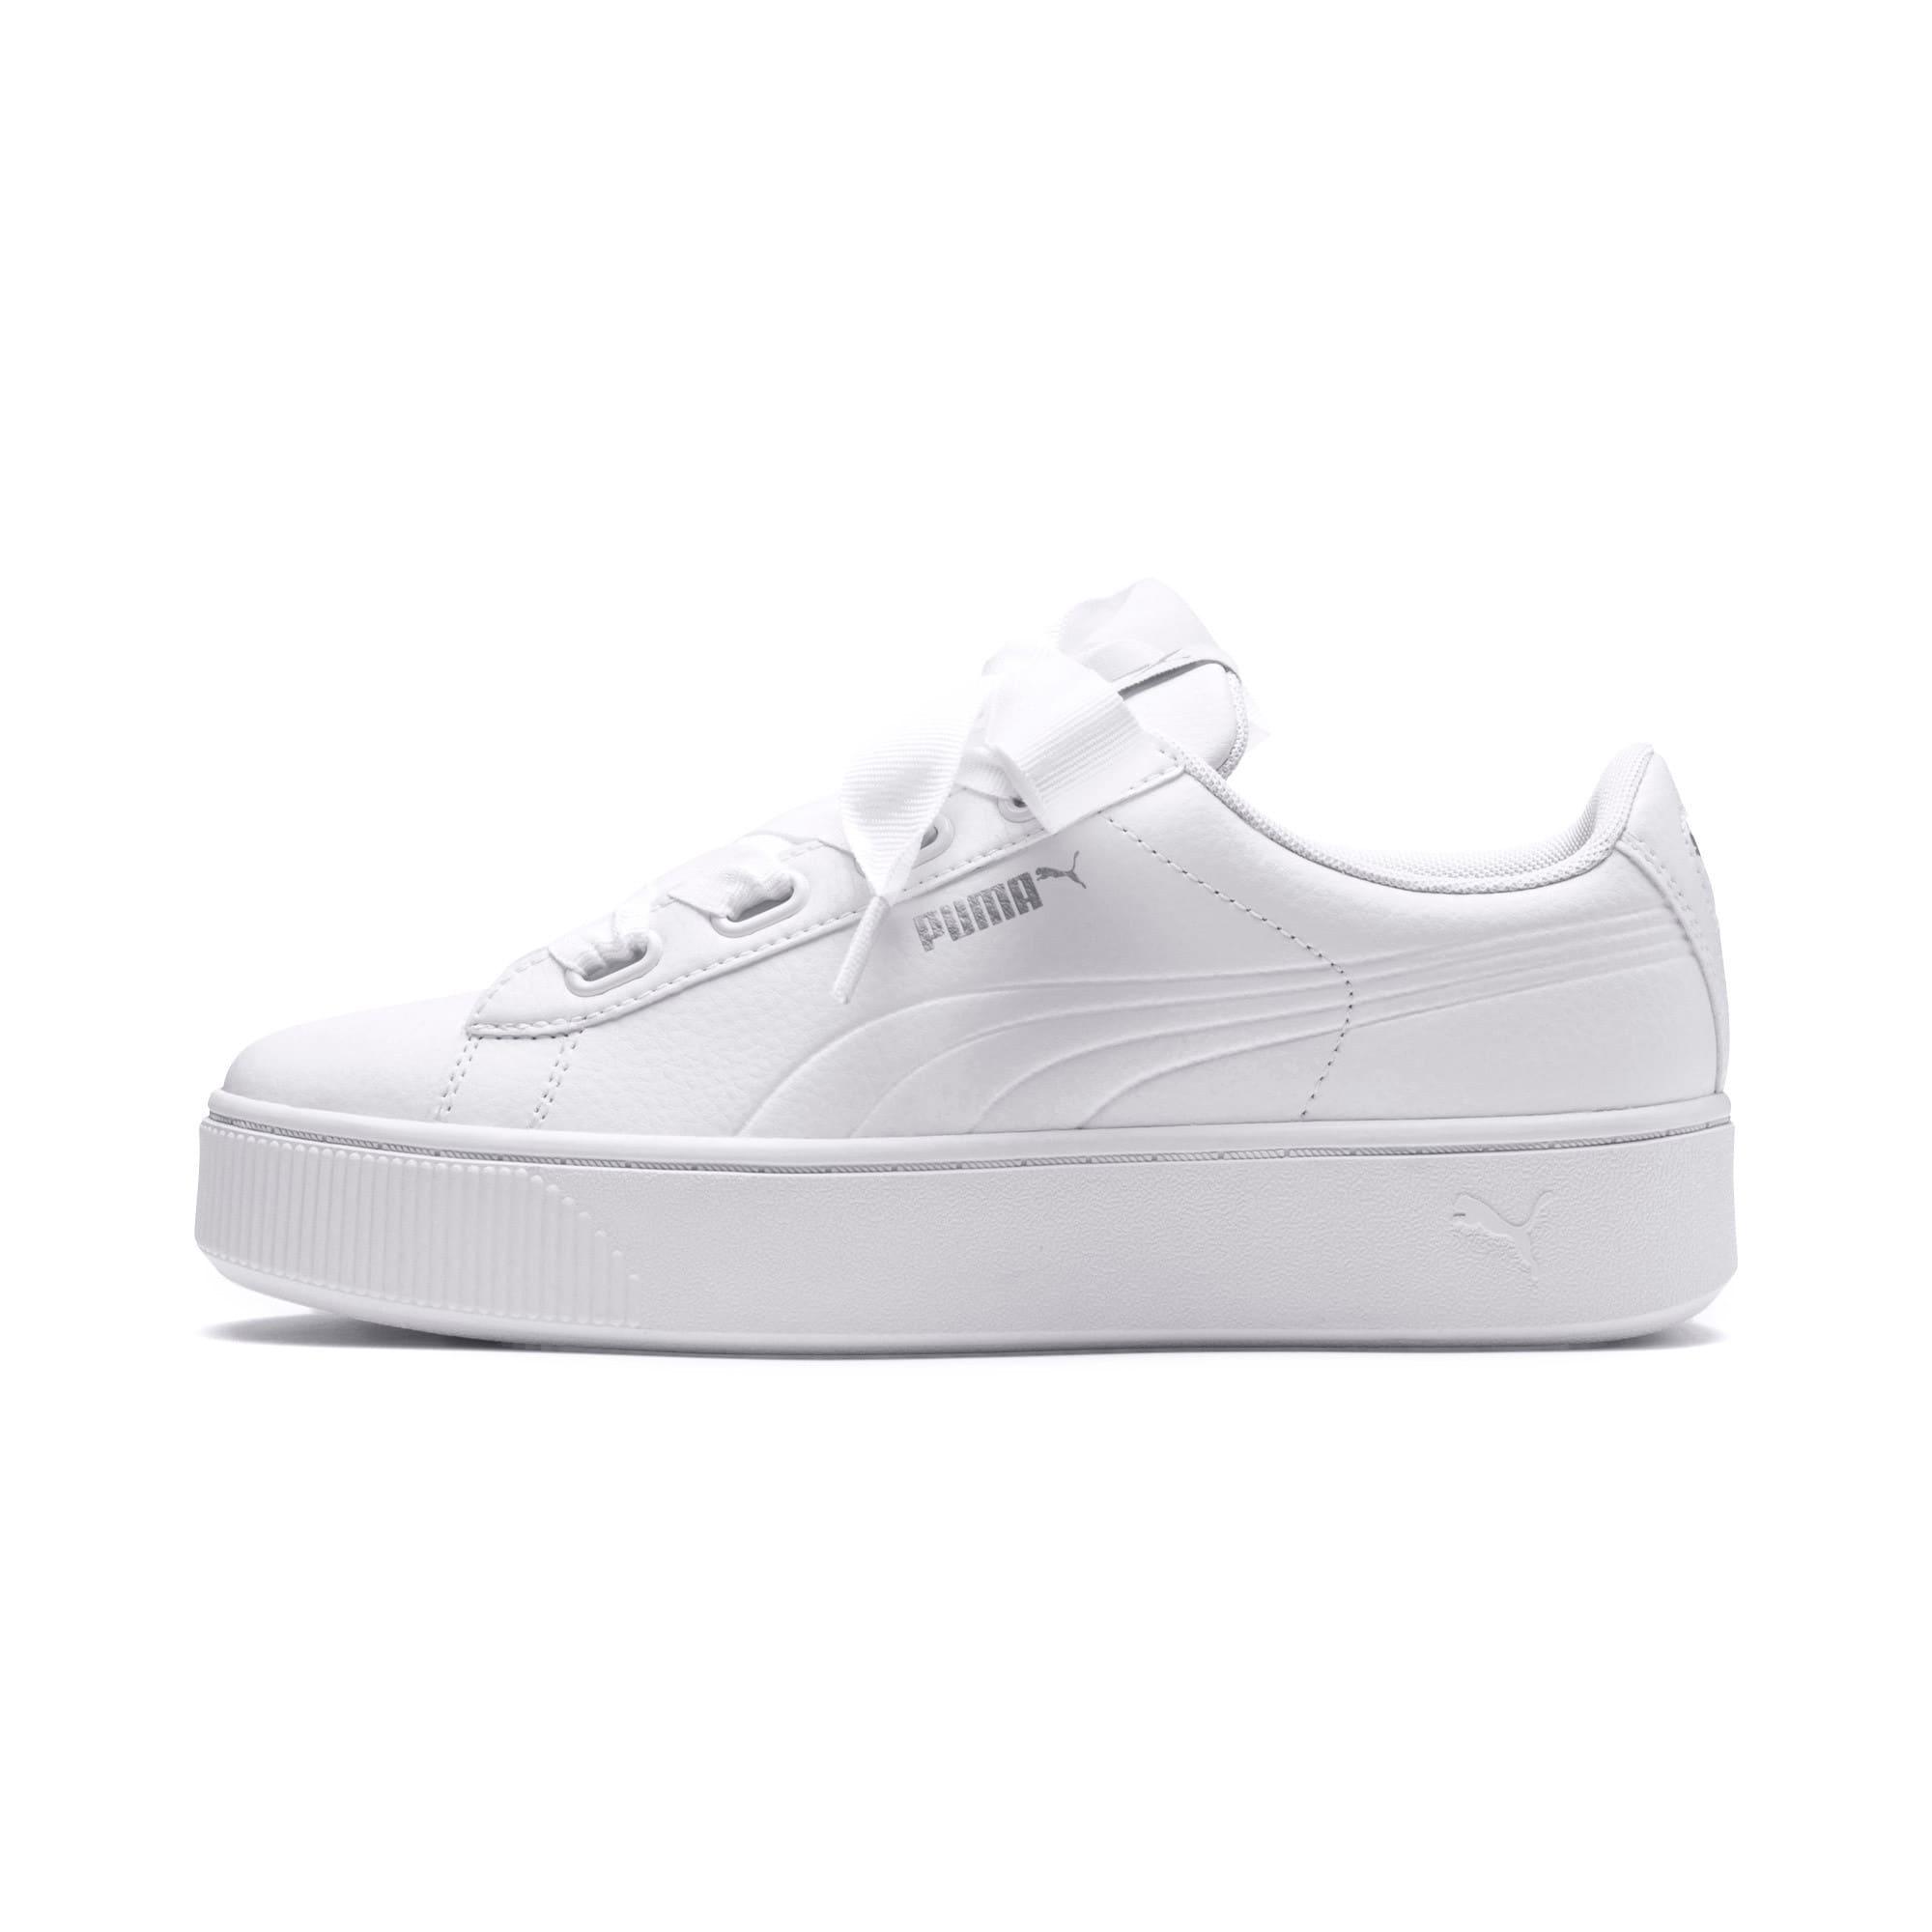 Thumbnail 1 of PUMA Vikky Stacked Ribbon Core Women's Sneakers, Puma White-Puma White, medium